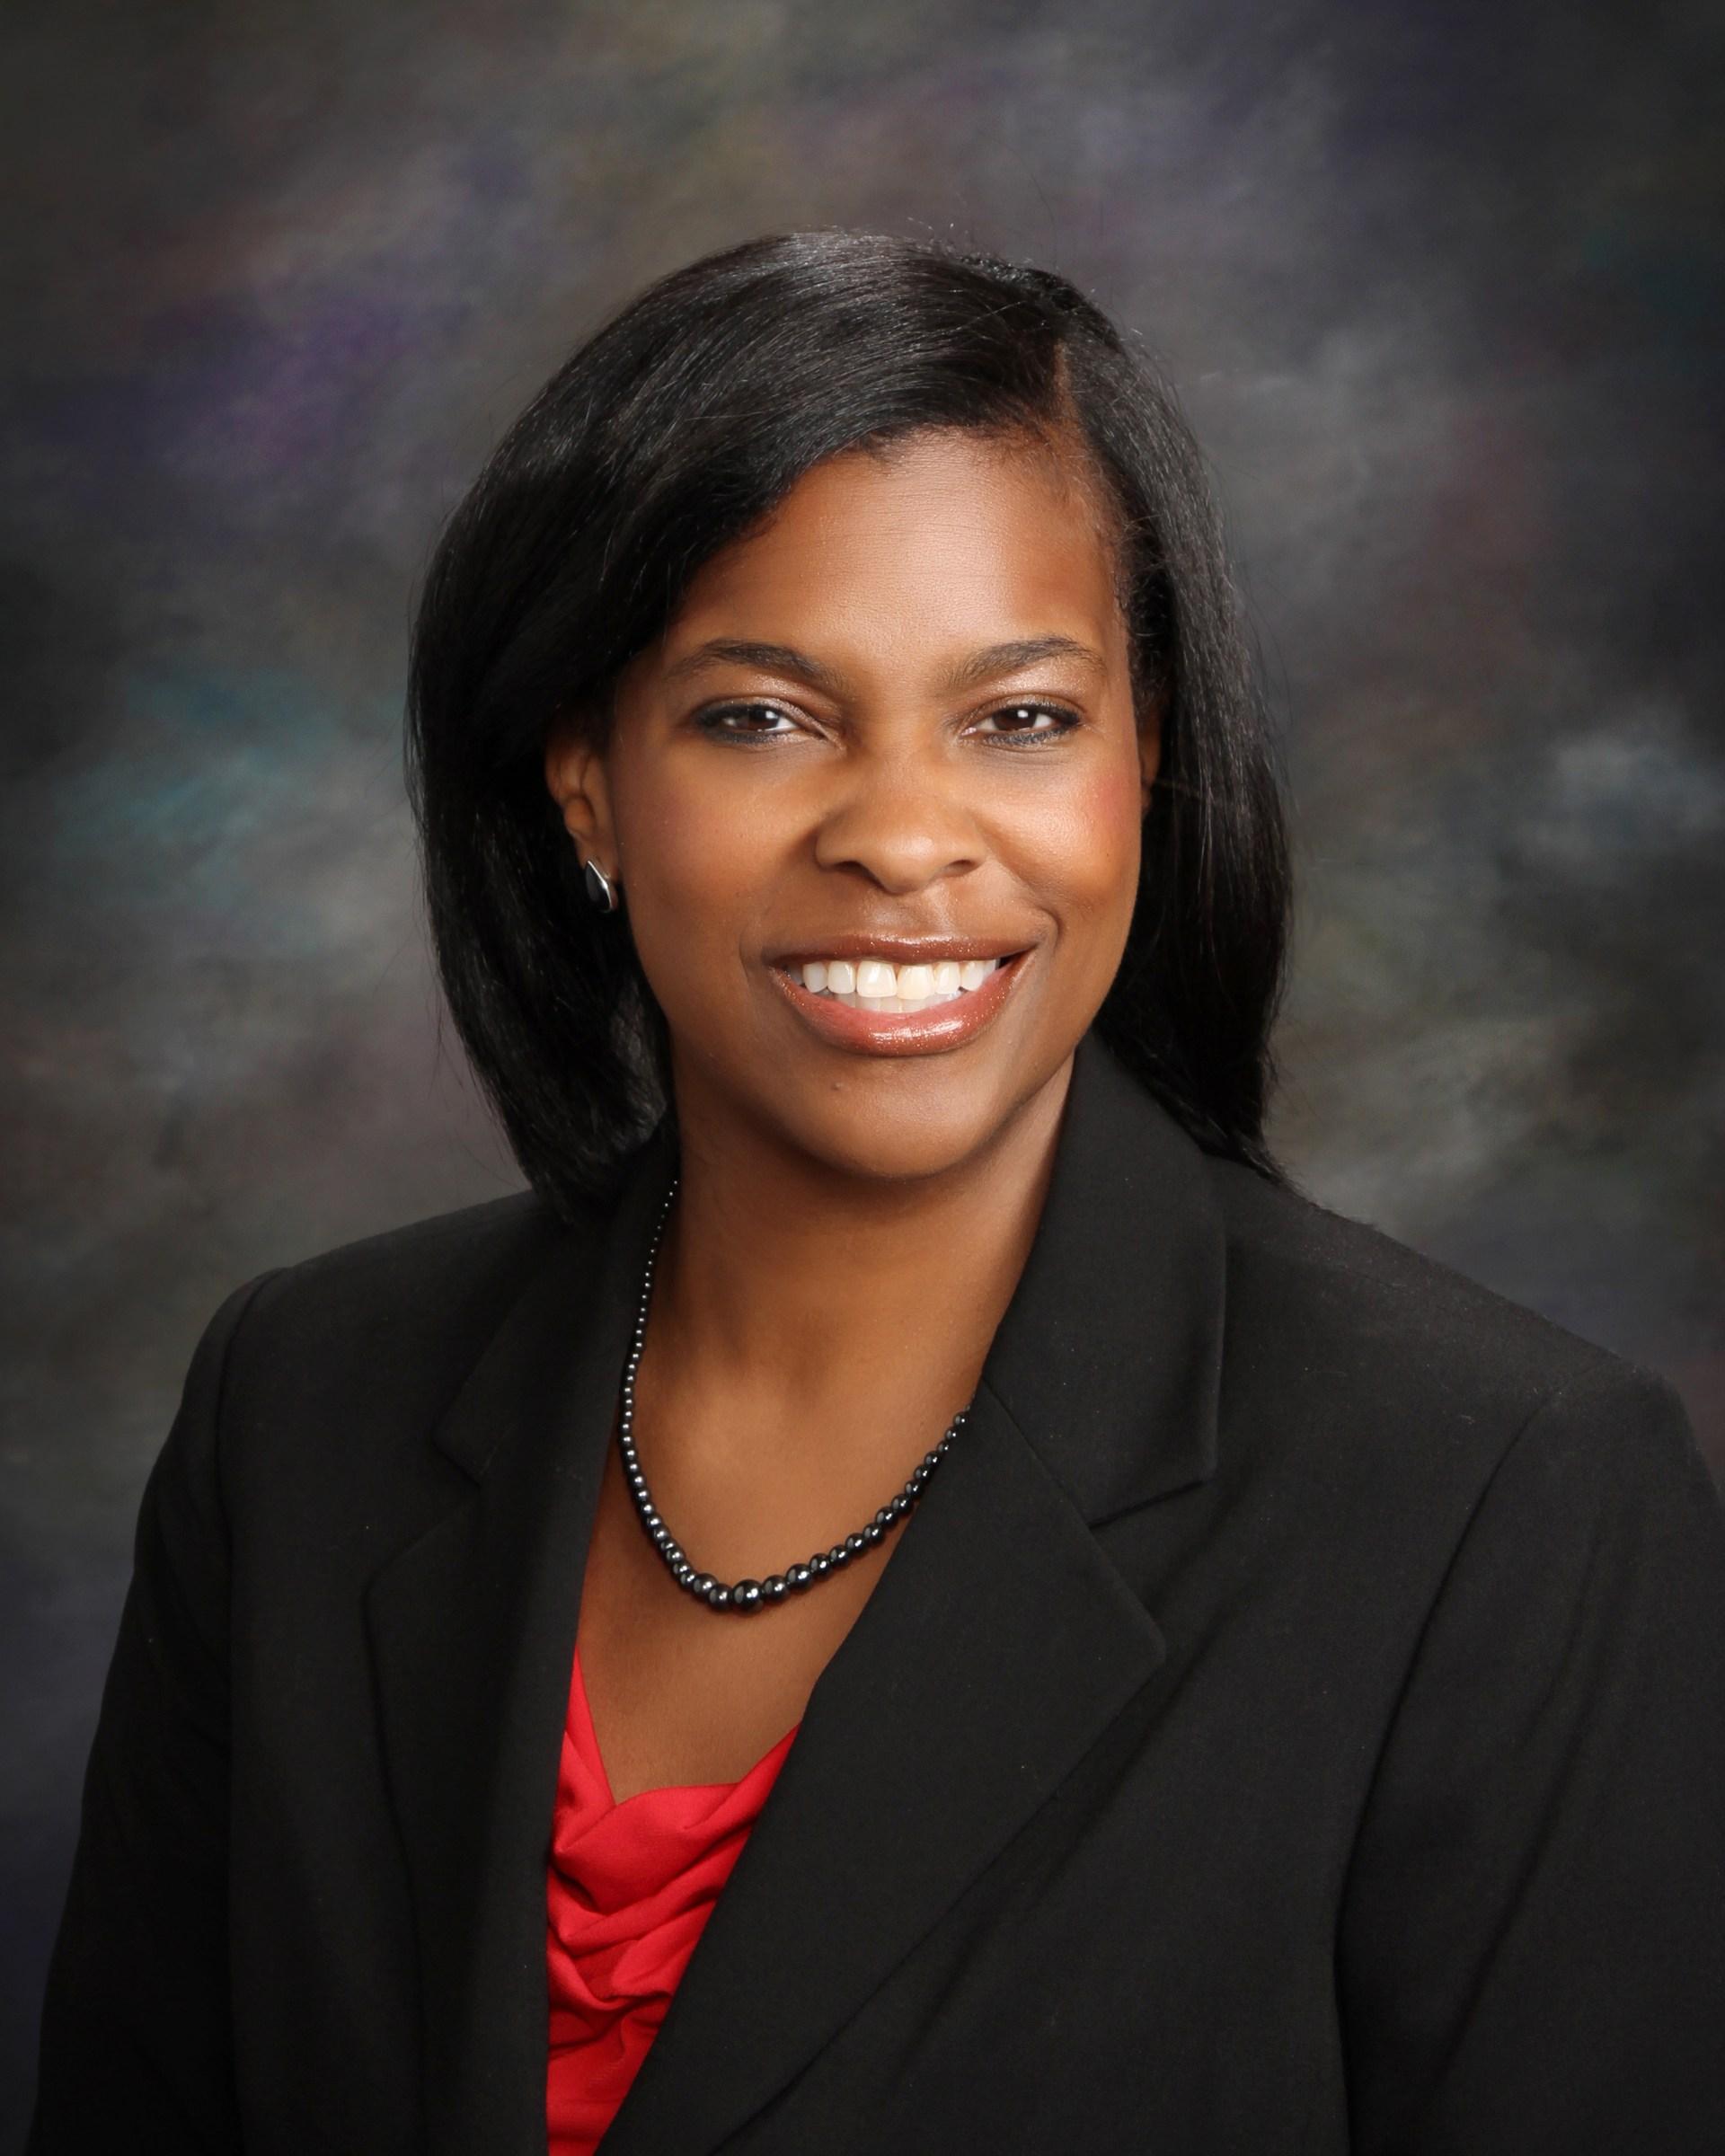 Dr. Cherise Moore